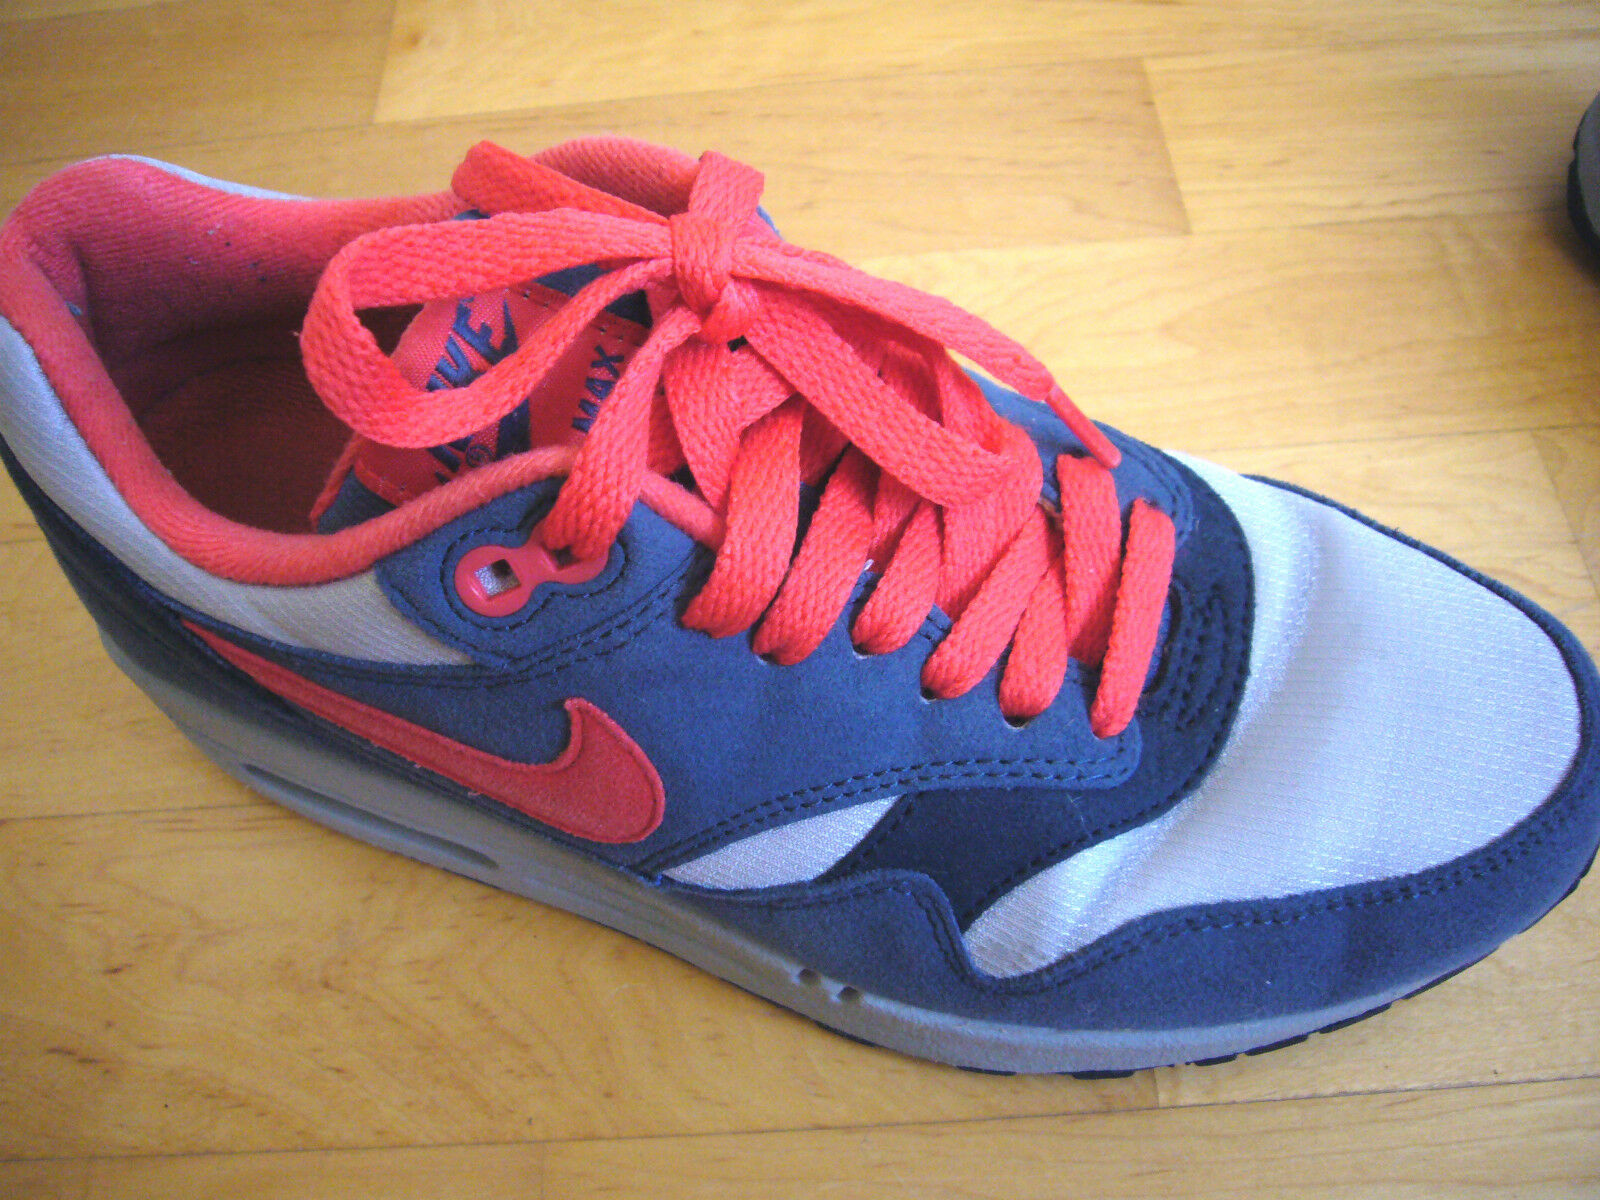 Nike AIR MAX 1 Turnschuh TurnschuheBlau MelonLim.EditionUk 4,5 EUR 38w.Neu